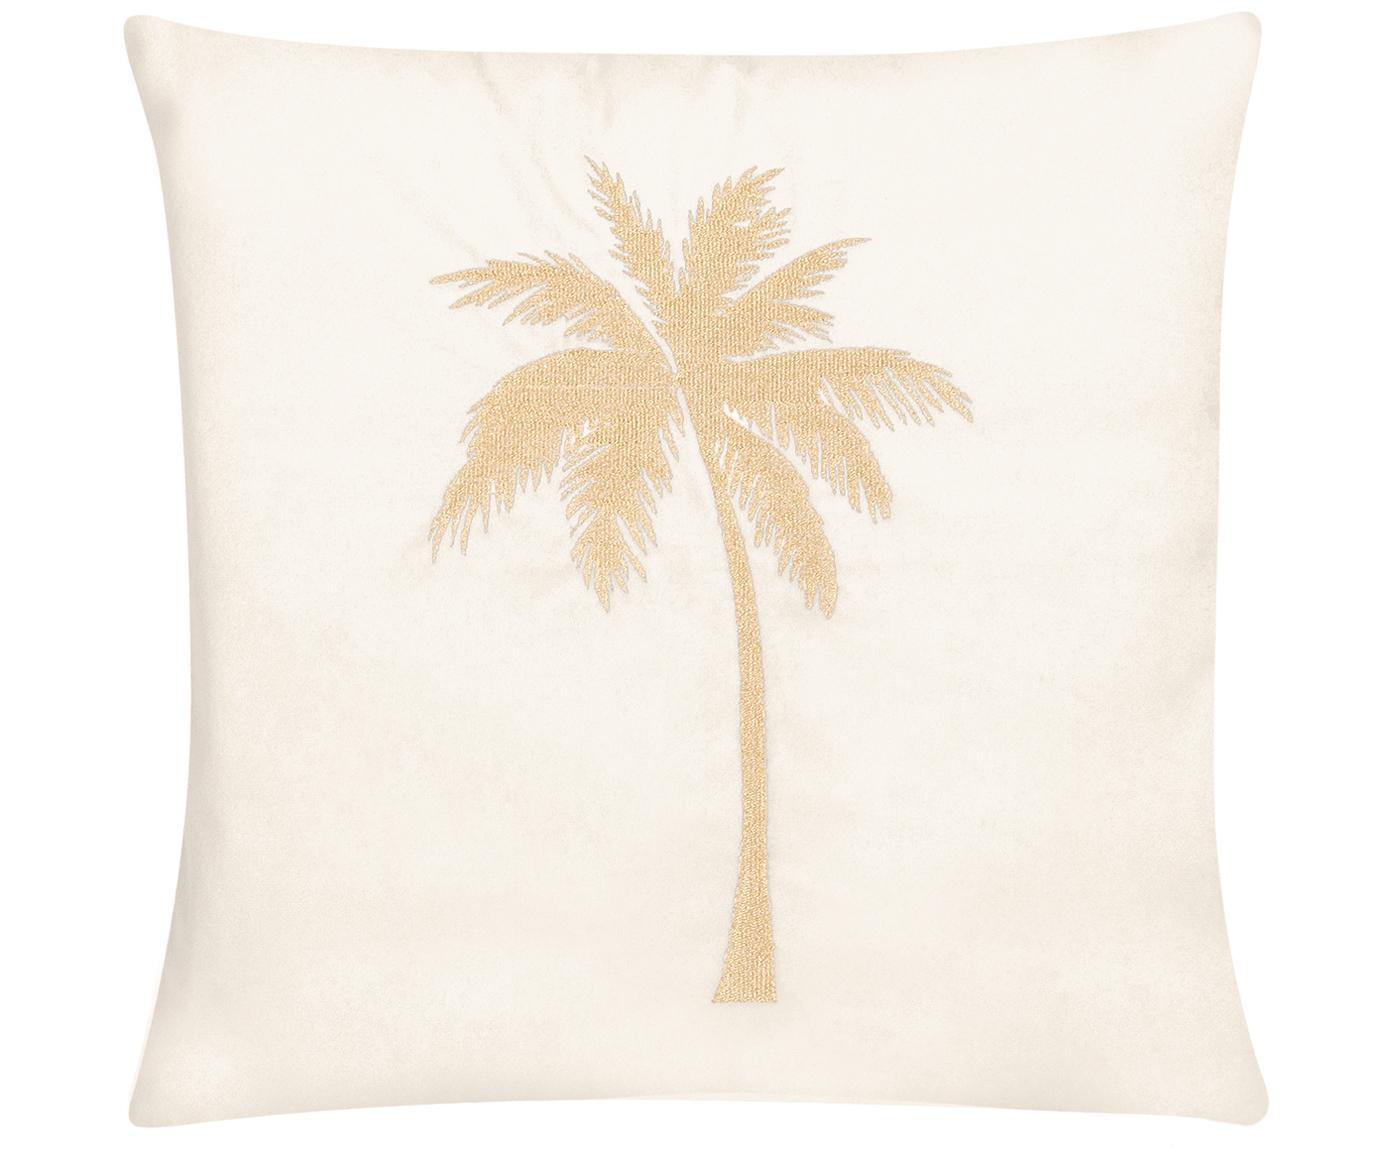 Funda de cojín bordada de terciopelo brillante Palmsprings, Terciopelo de poliéster, Blanco crema, dorado, An 40 x L 40 cm